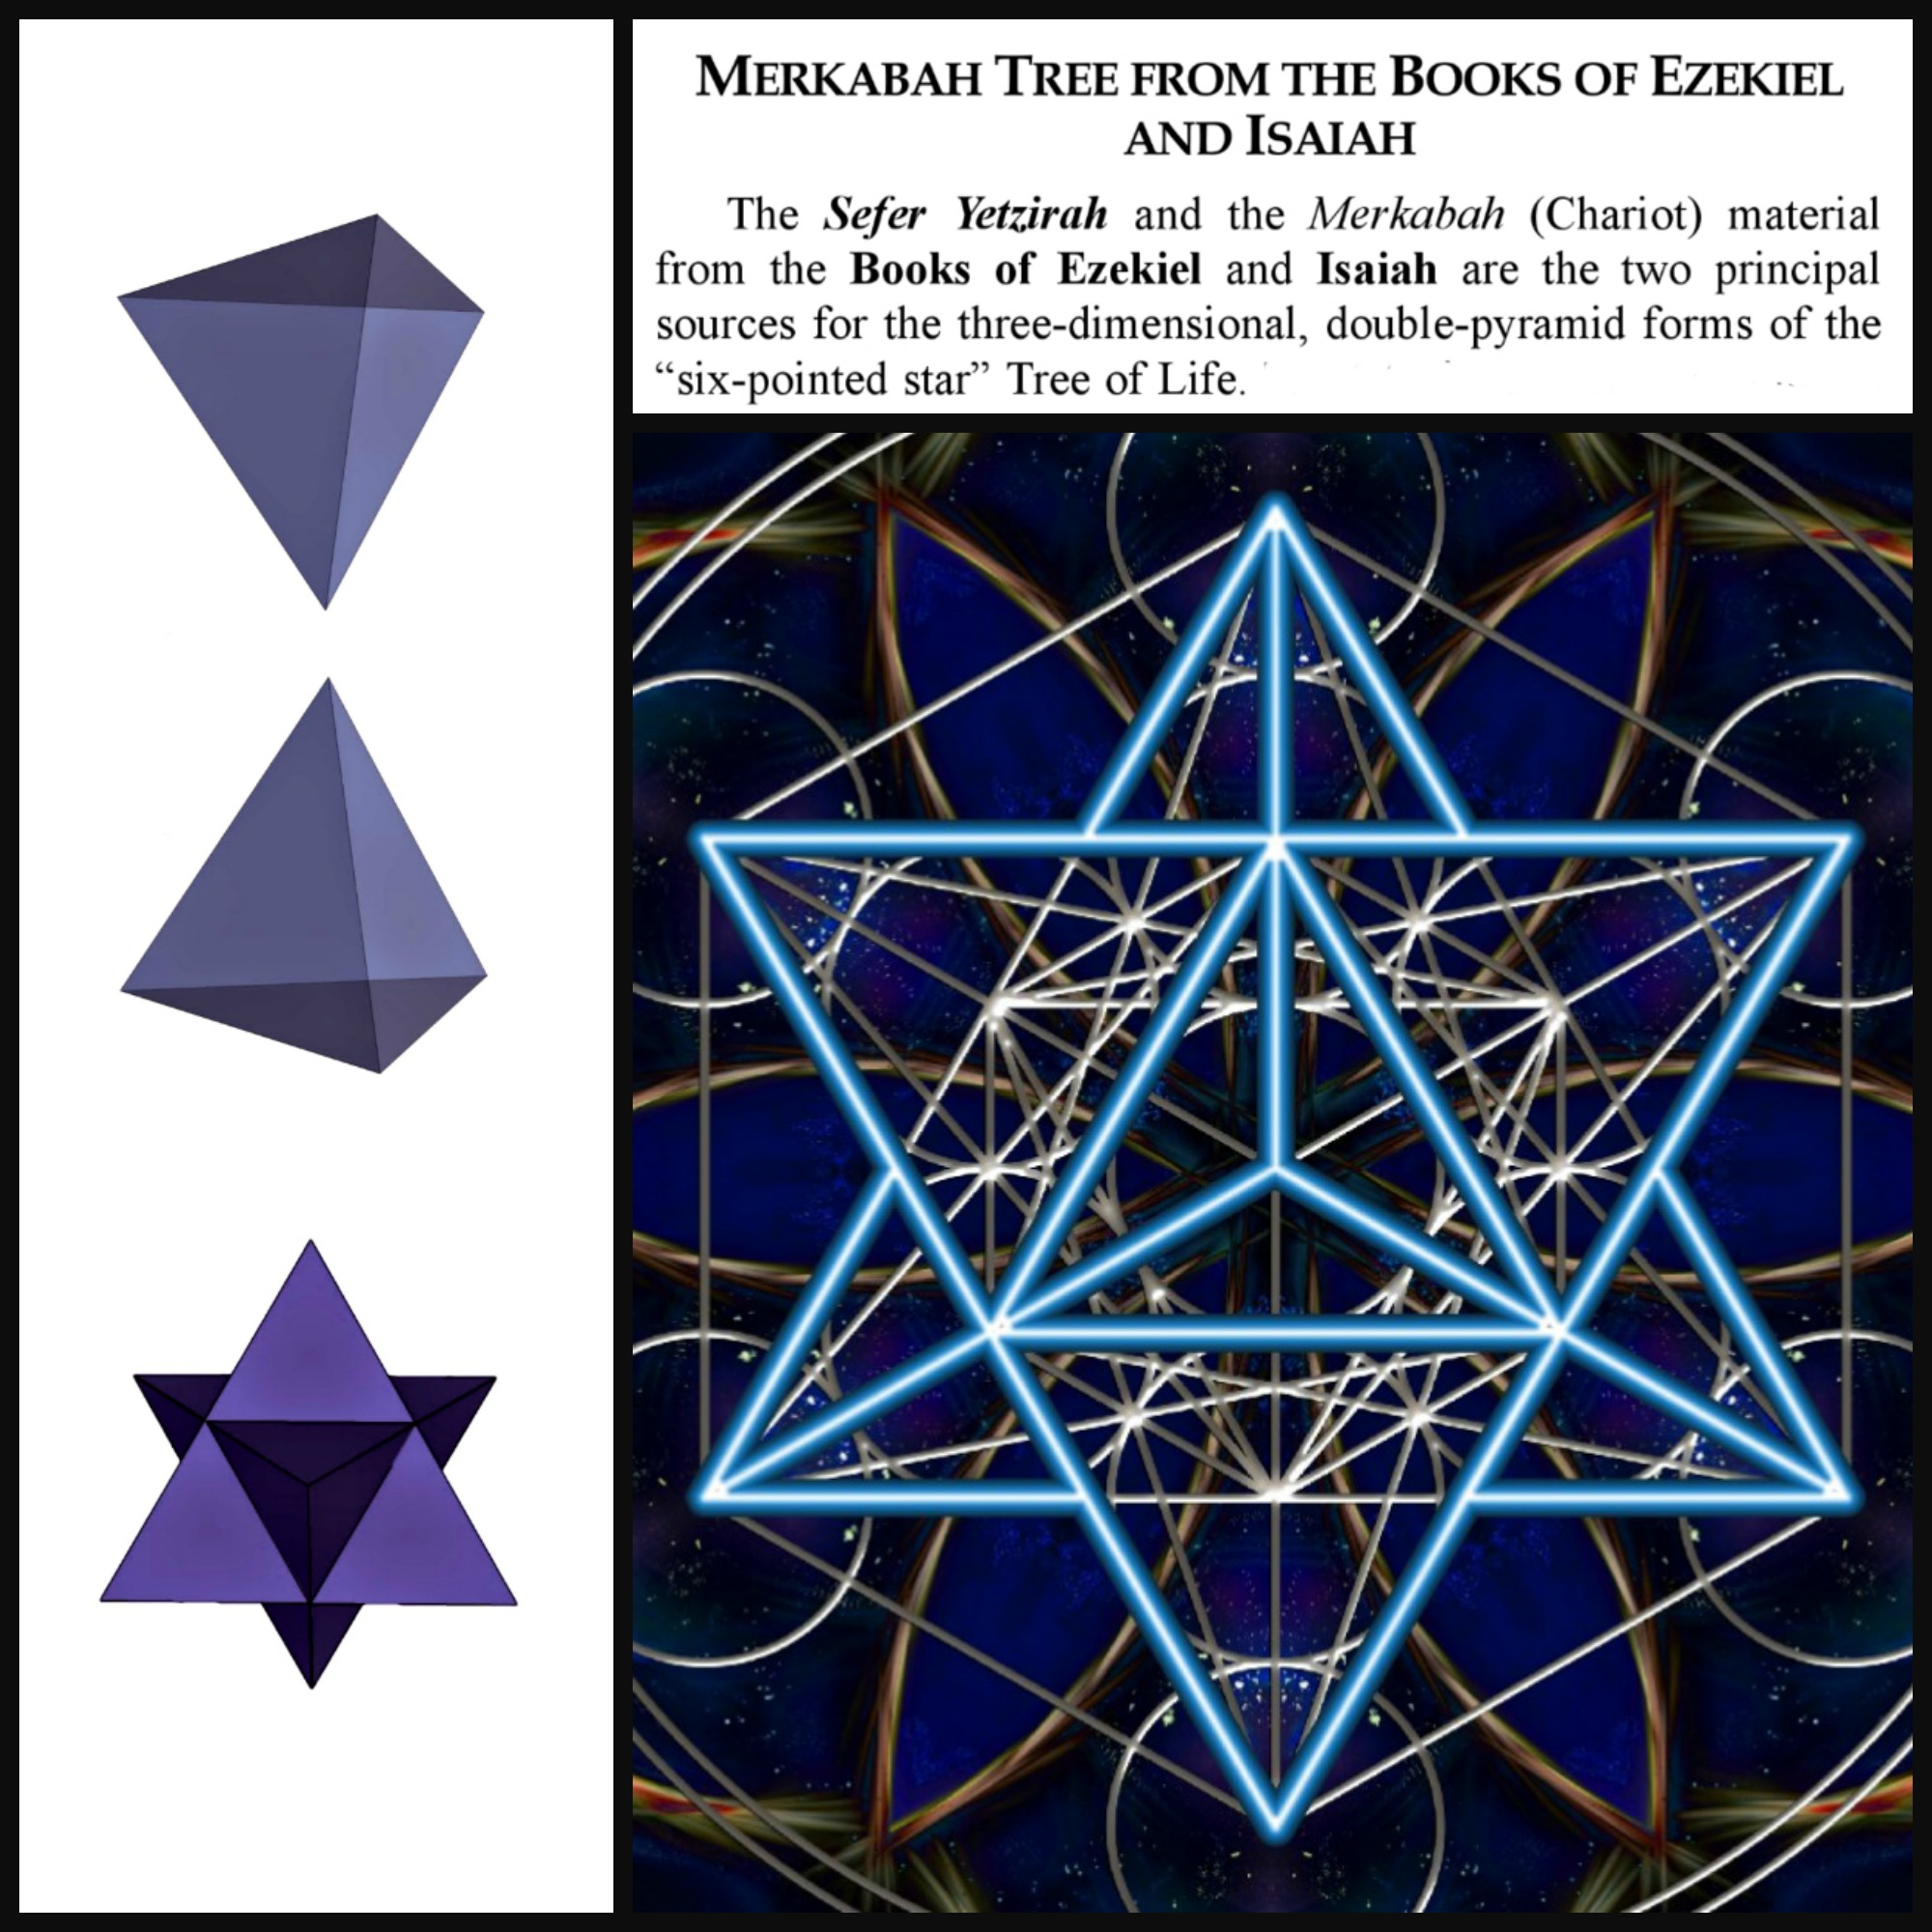 The Star Of David S 2 Pyramids The Star Of David